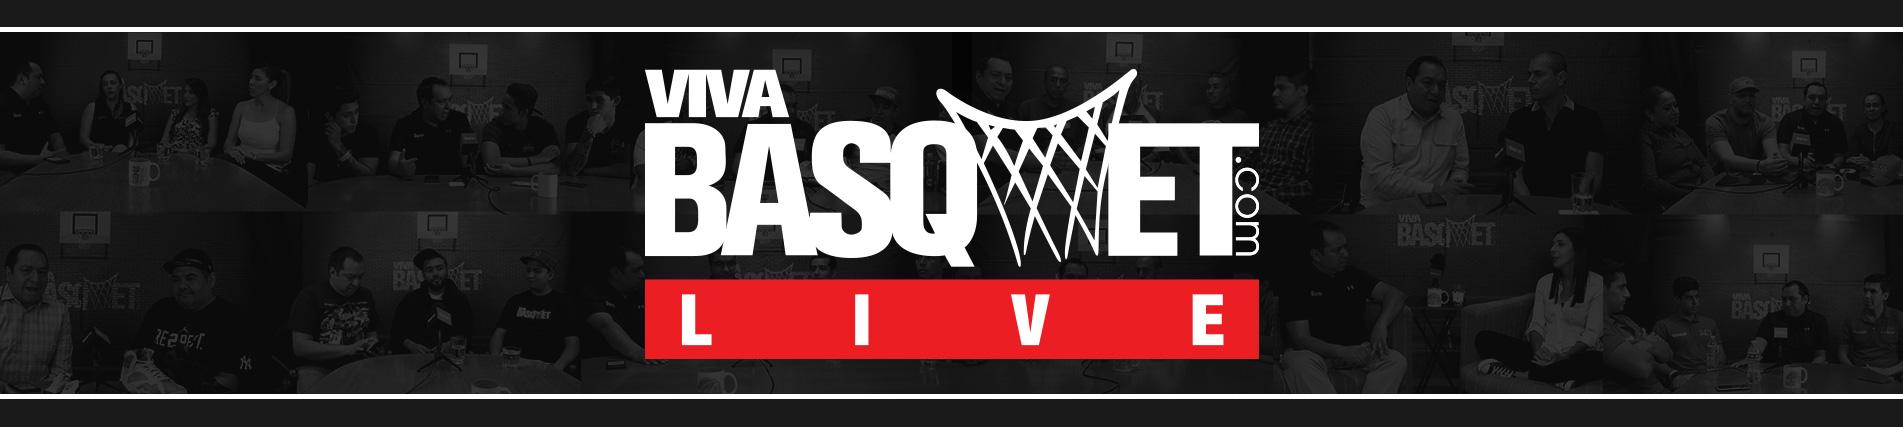 Viva Basquet live